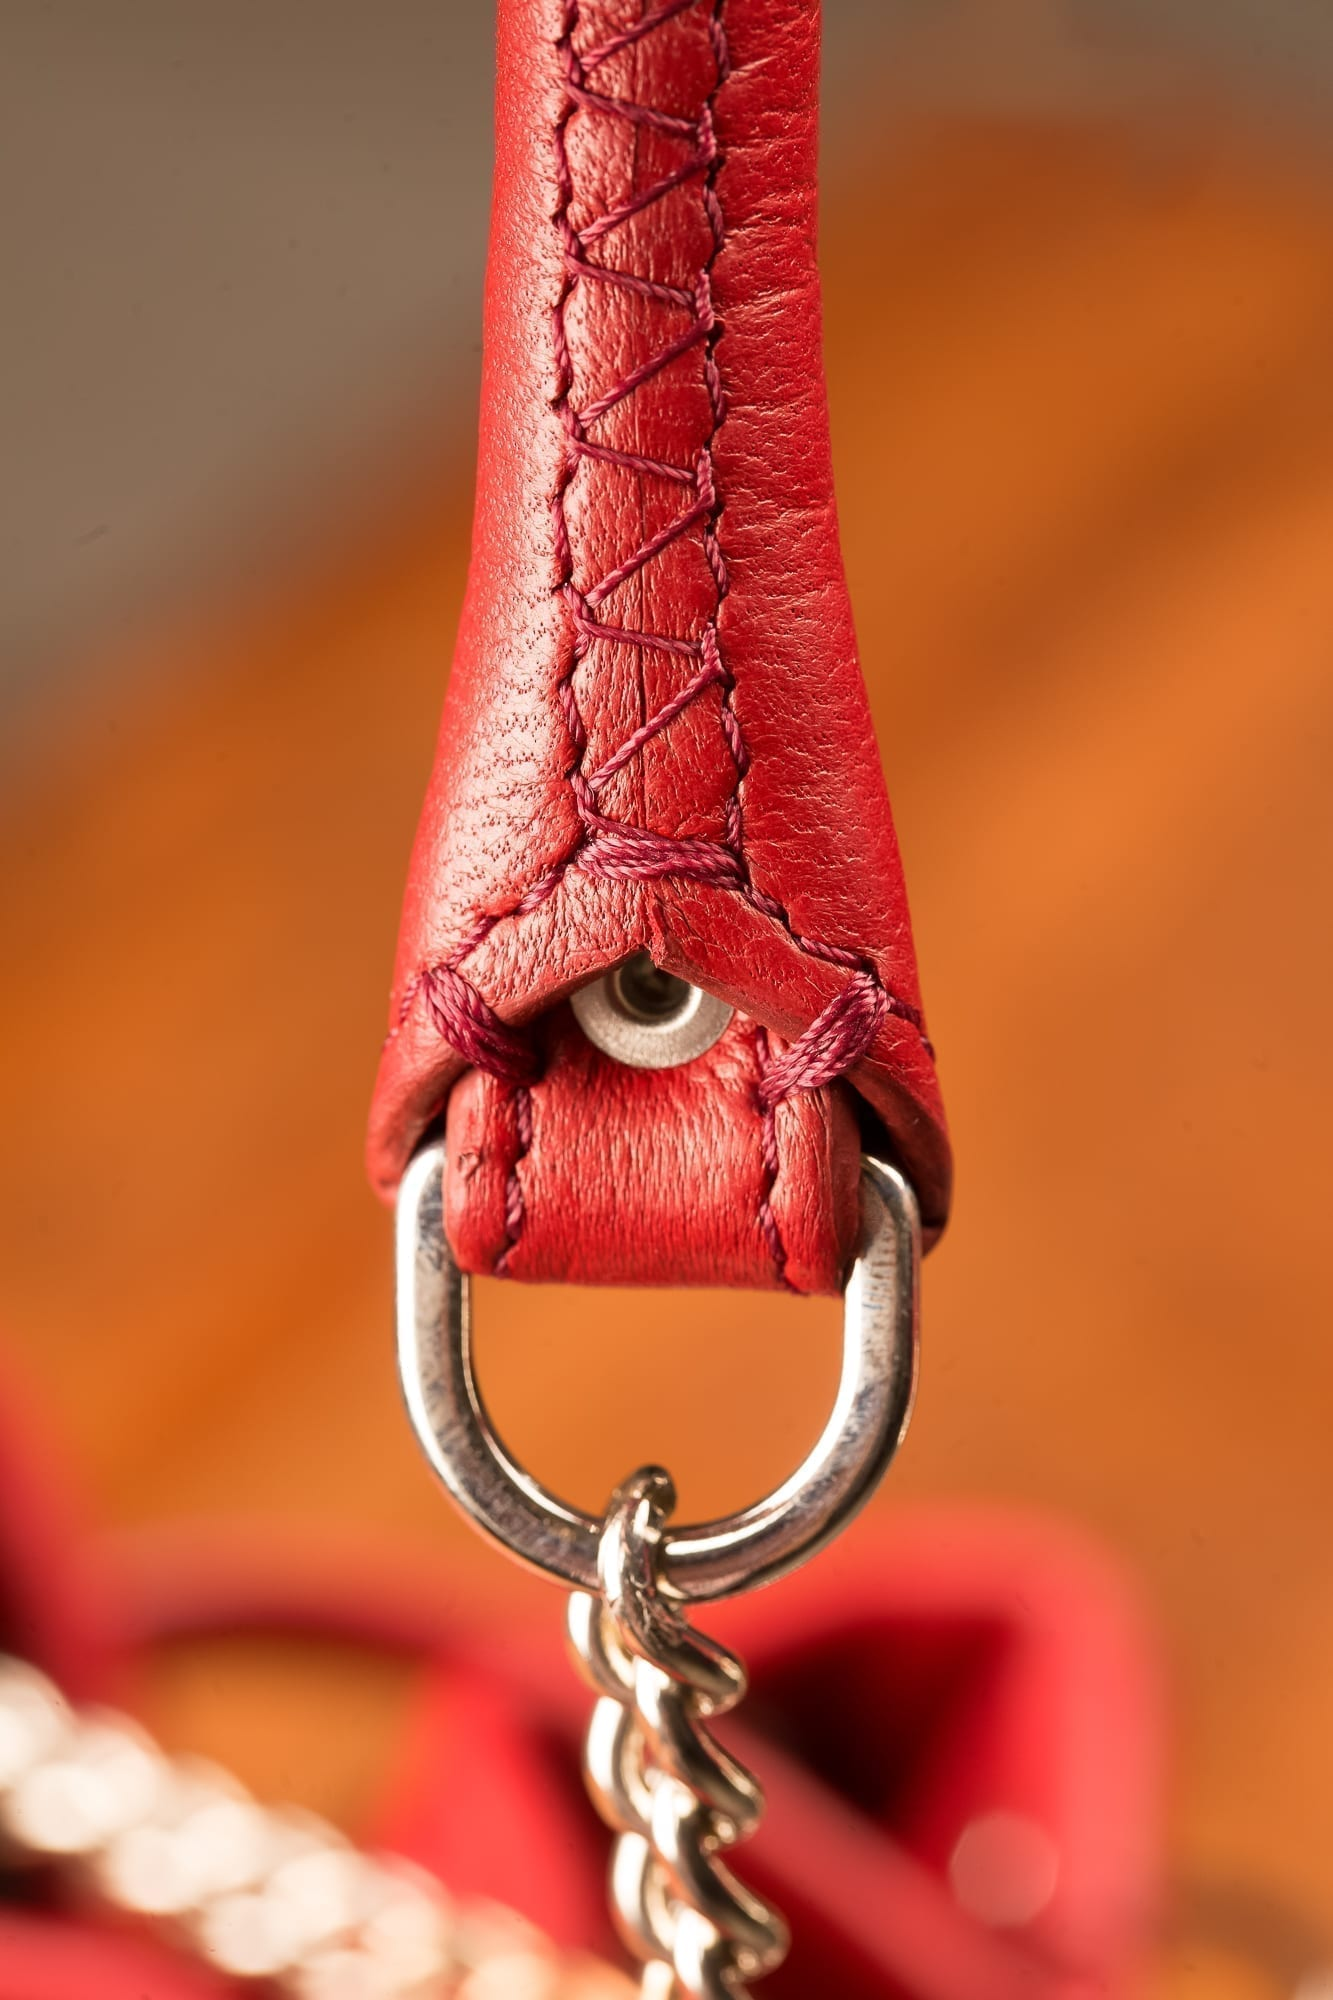 Packshot produit, sac, maroquinerie, Studio End pro Rodez